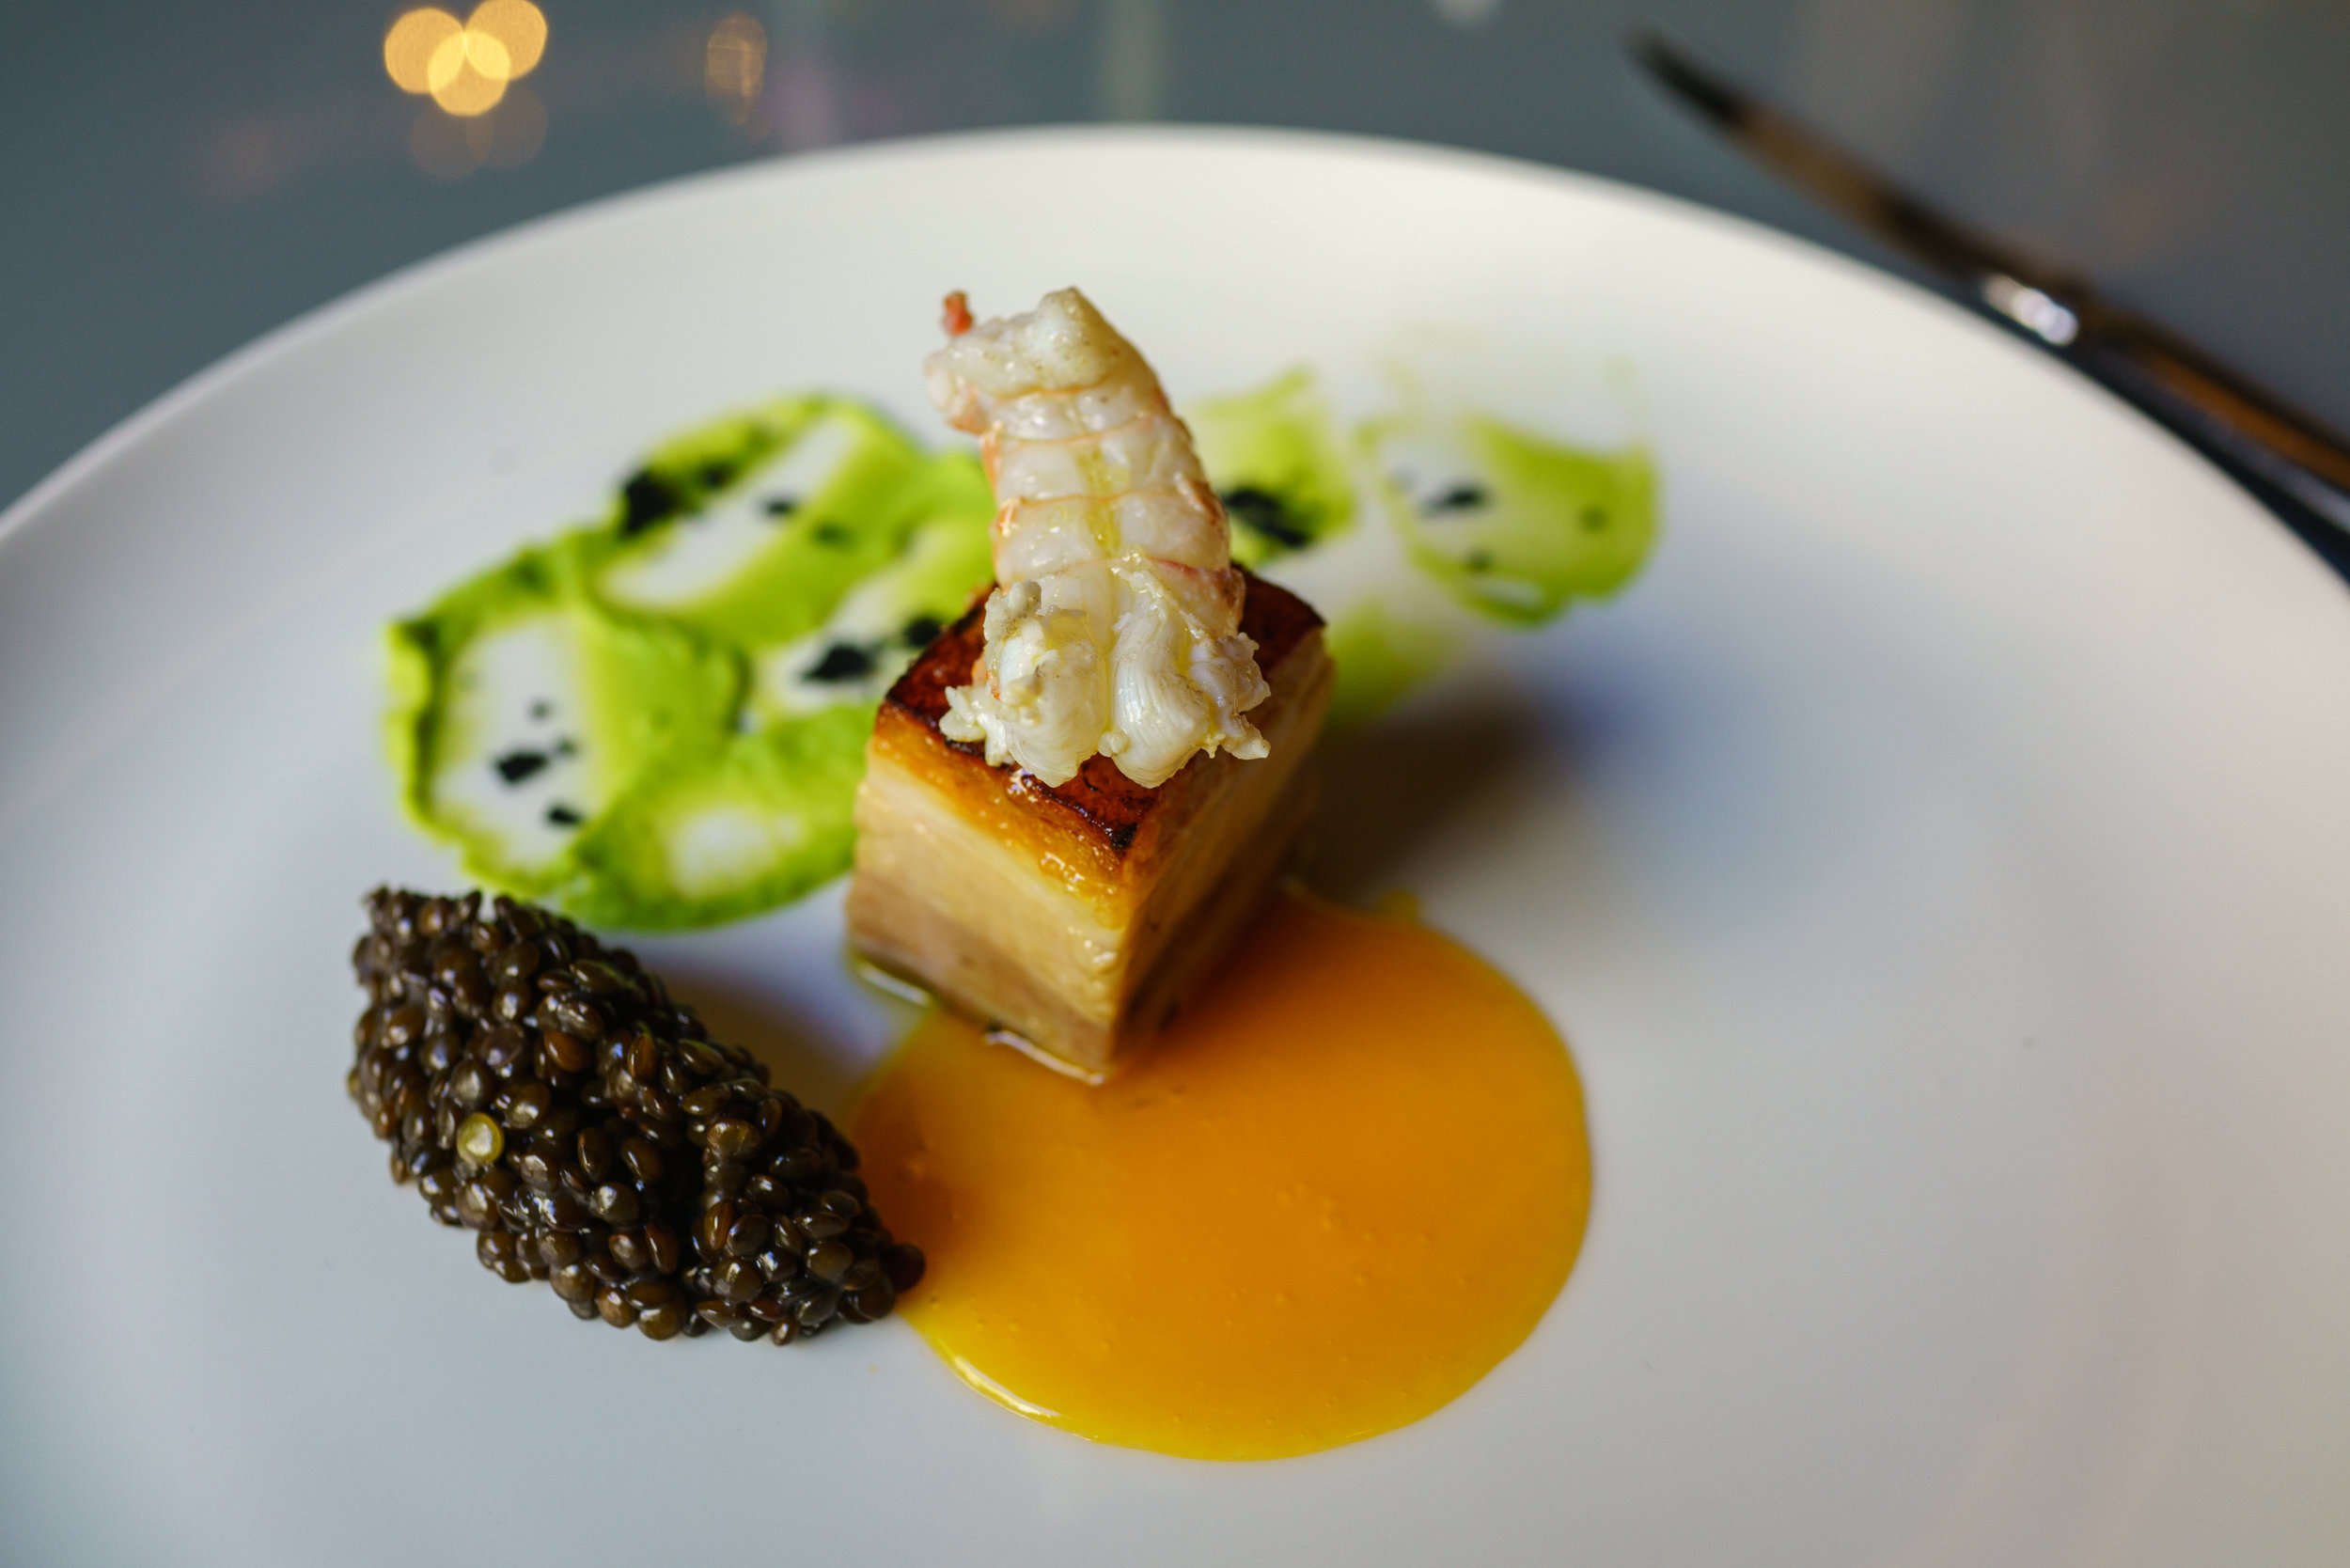 Pork belly, Shrimps, Parsley, Passion frui